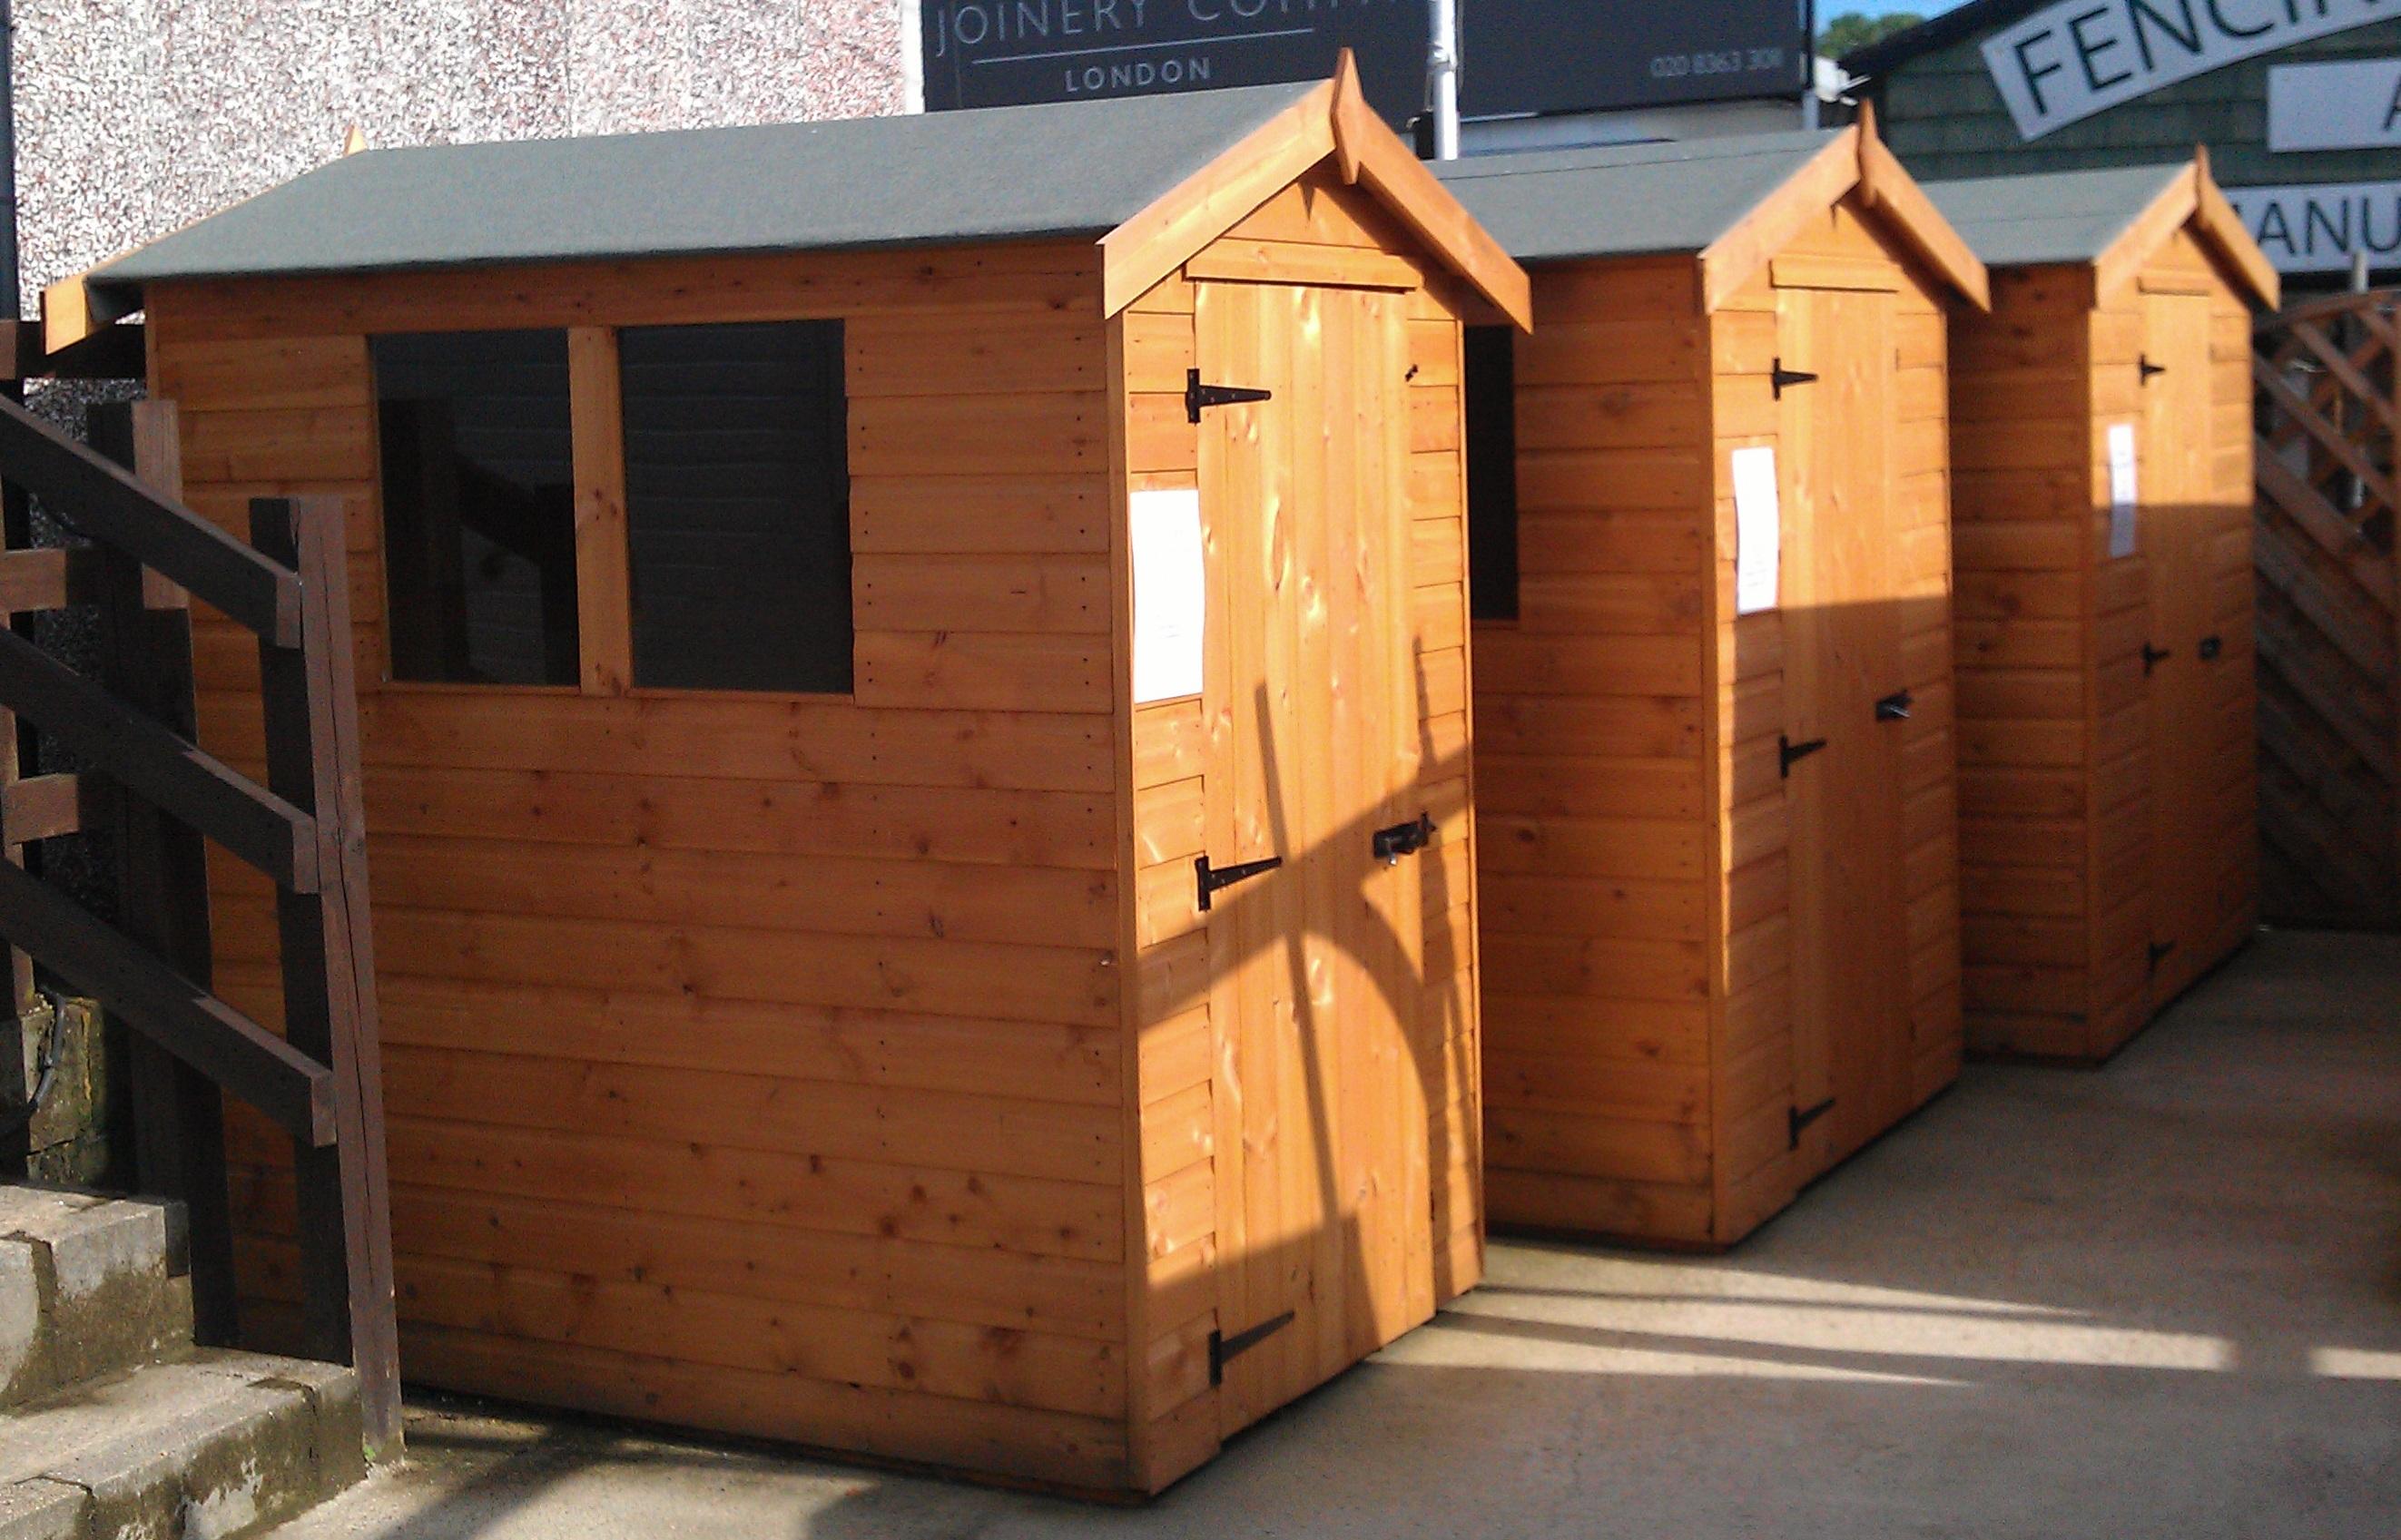 Dennington Apex wooden shed 6x4